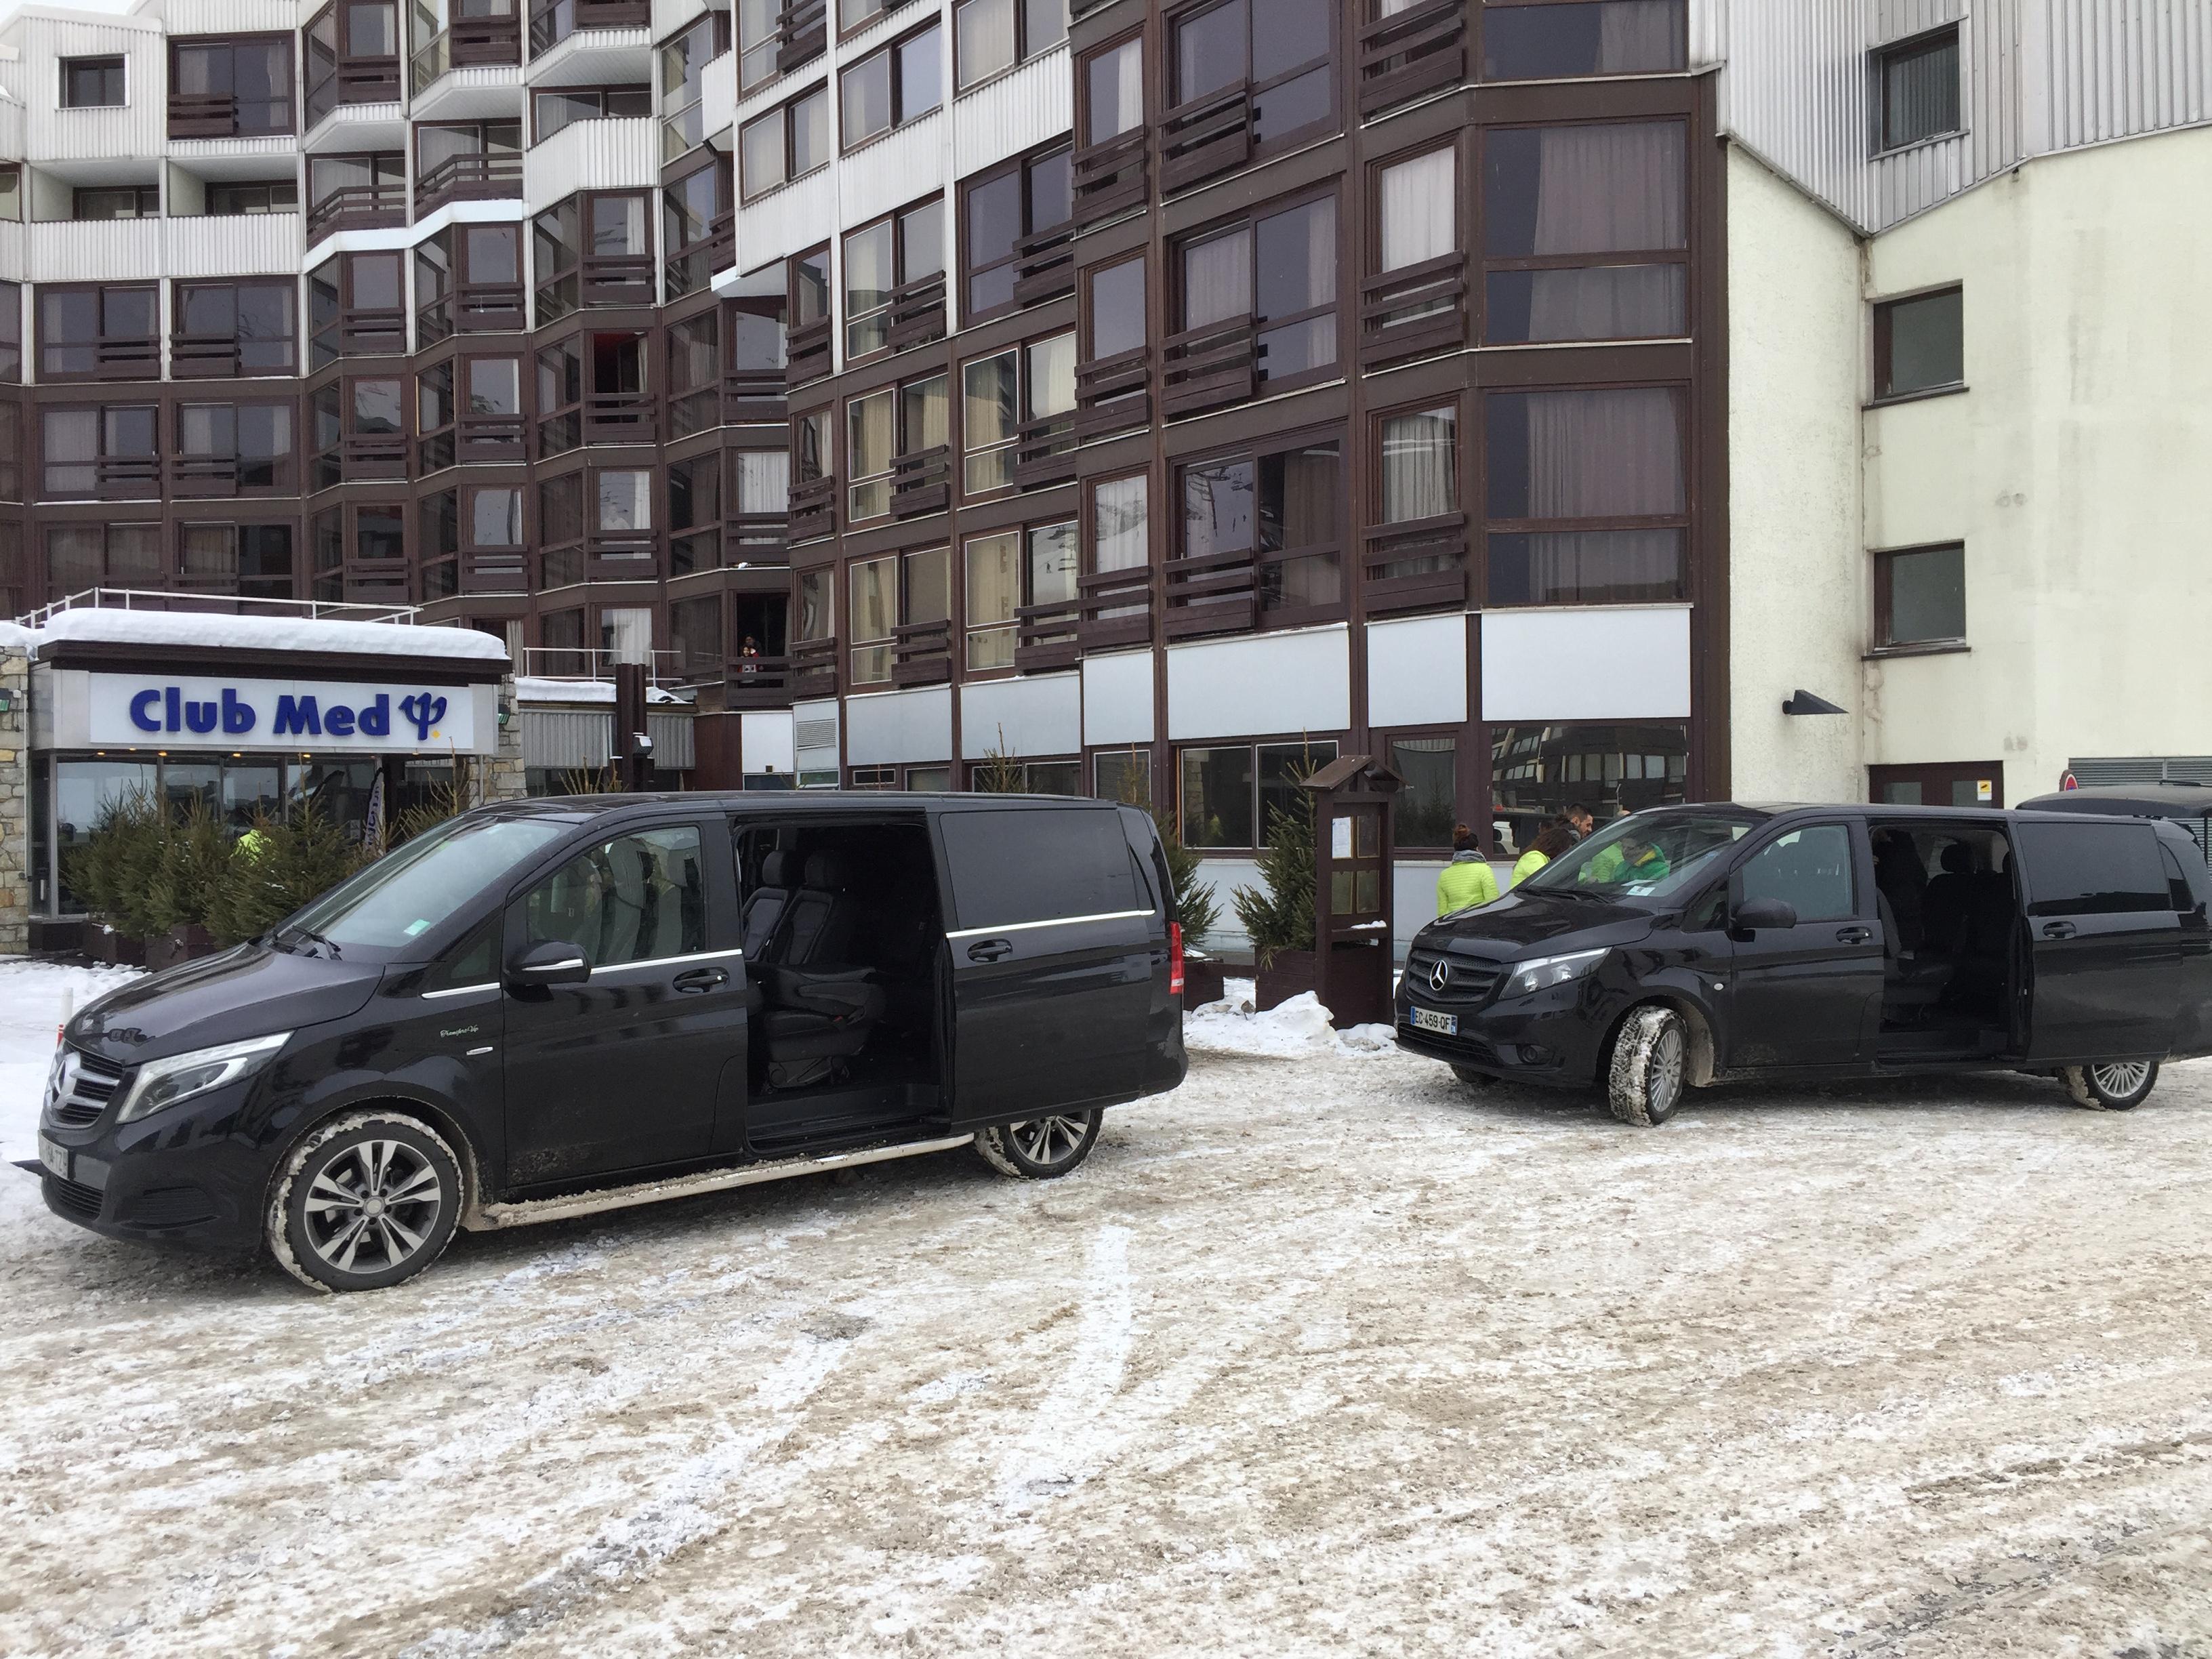 Transfert stations de Ski des Alpes